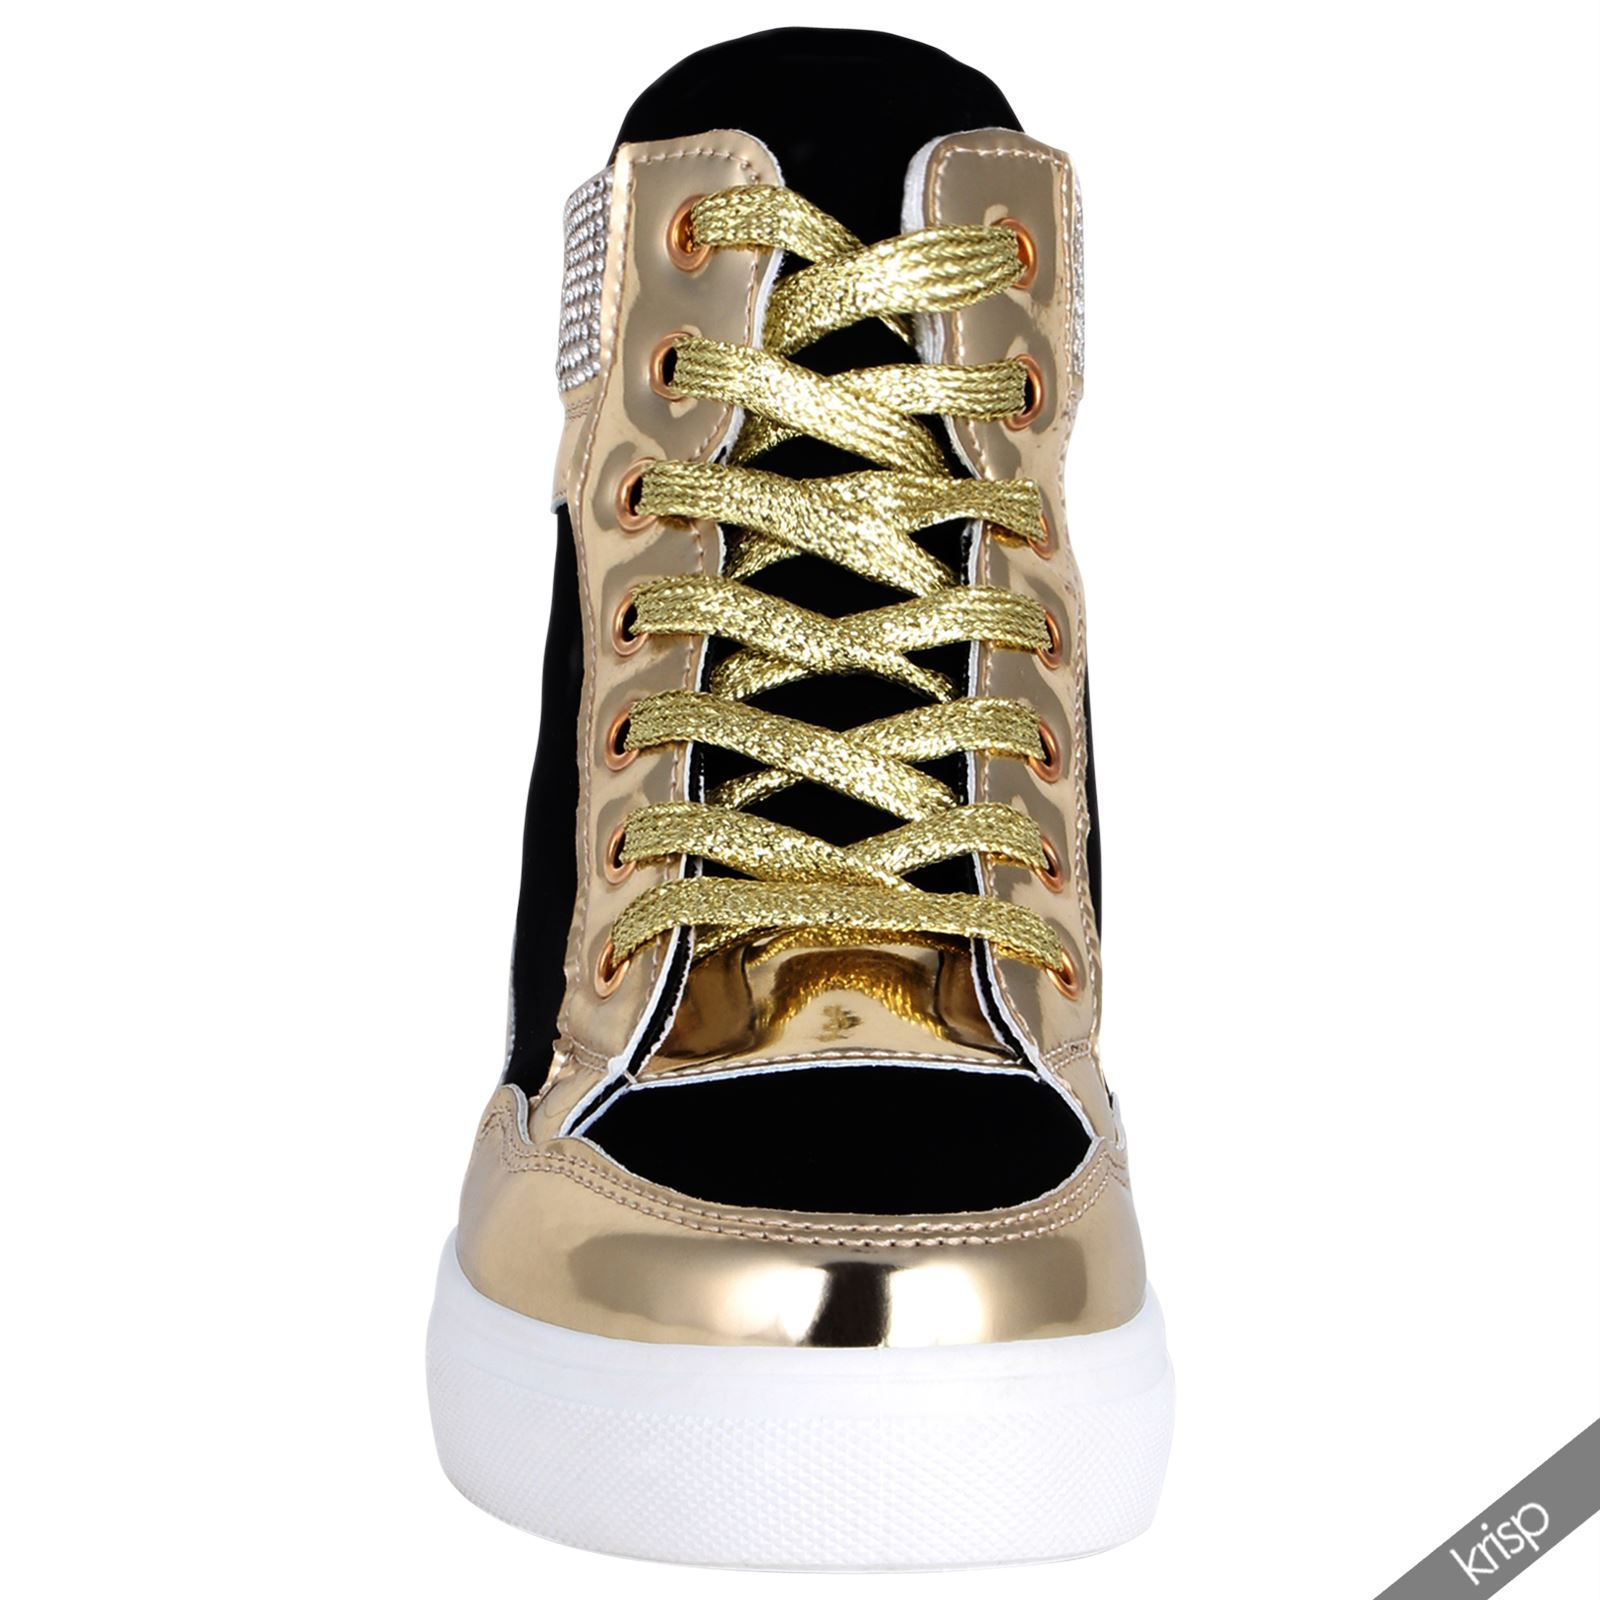 Studded Platform Tennis Shoes